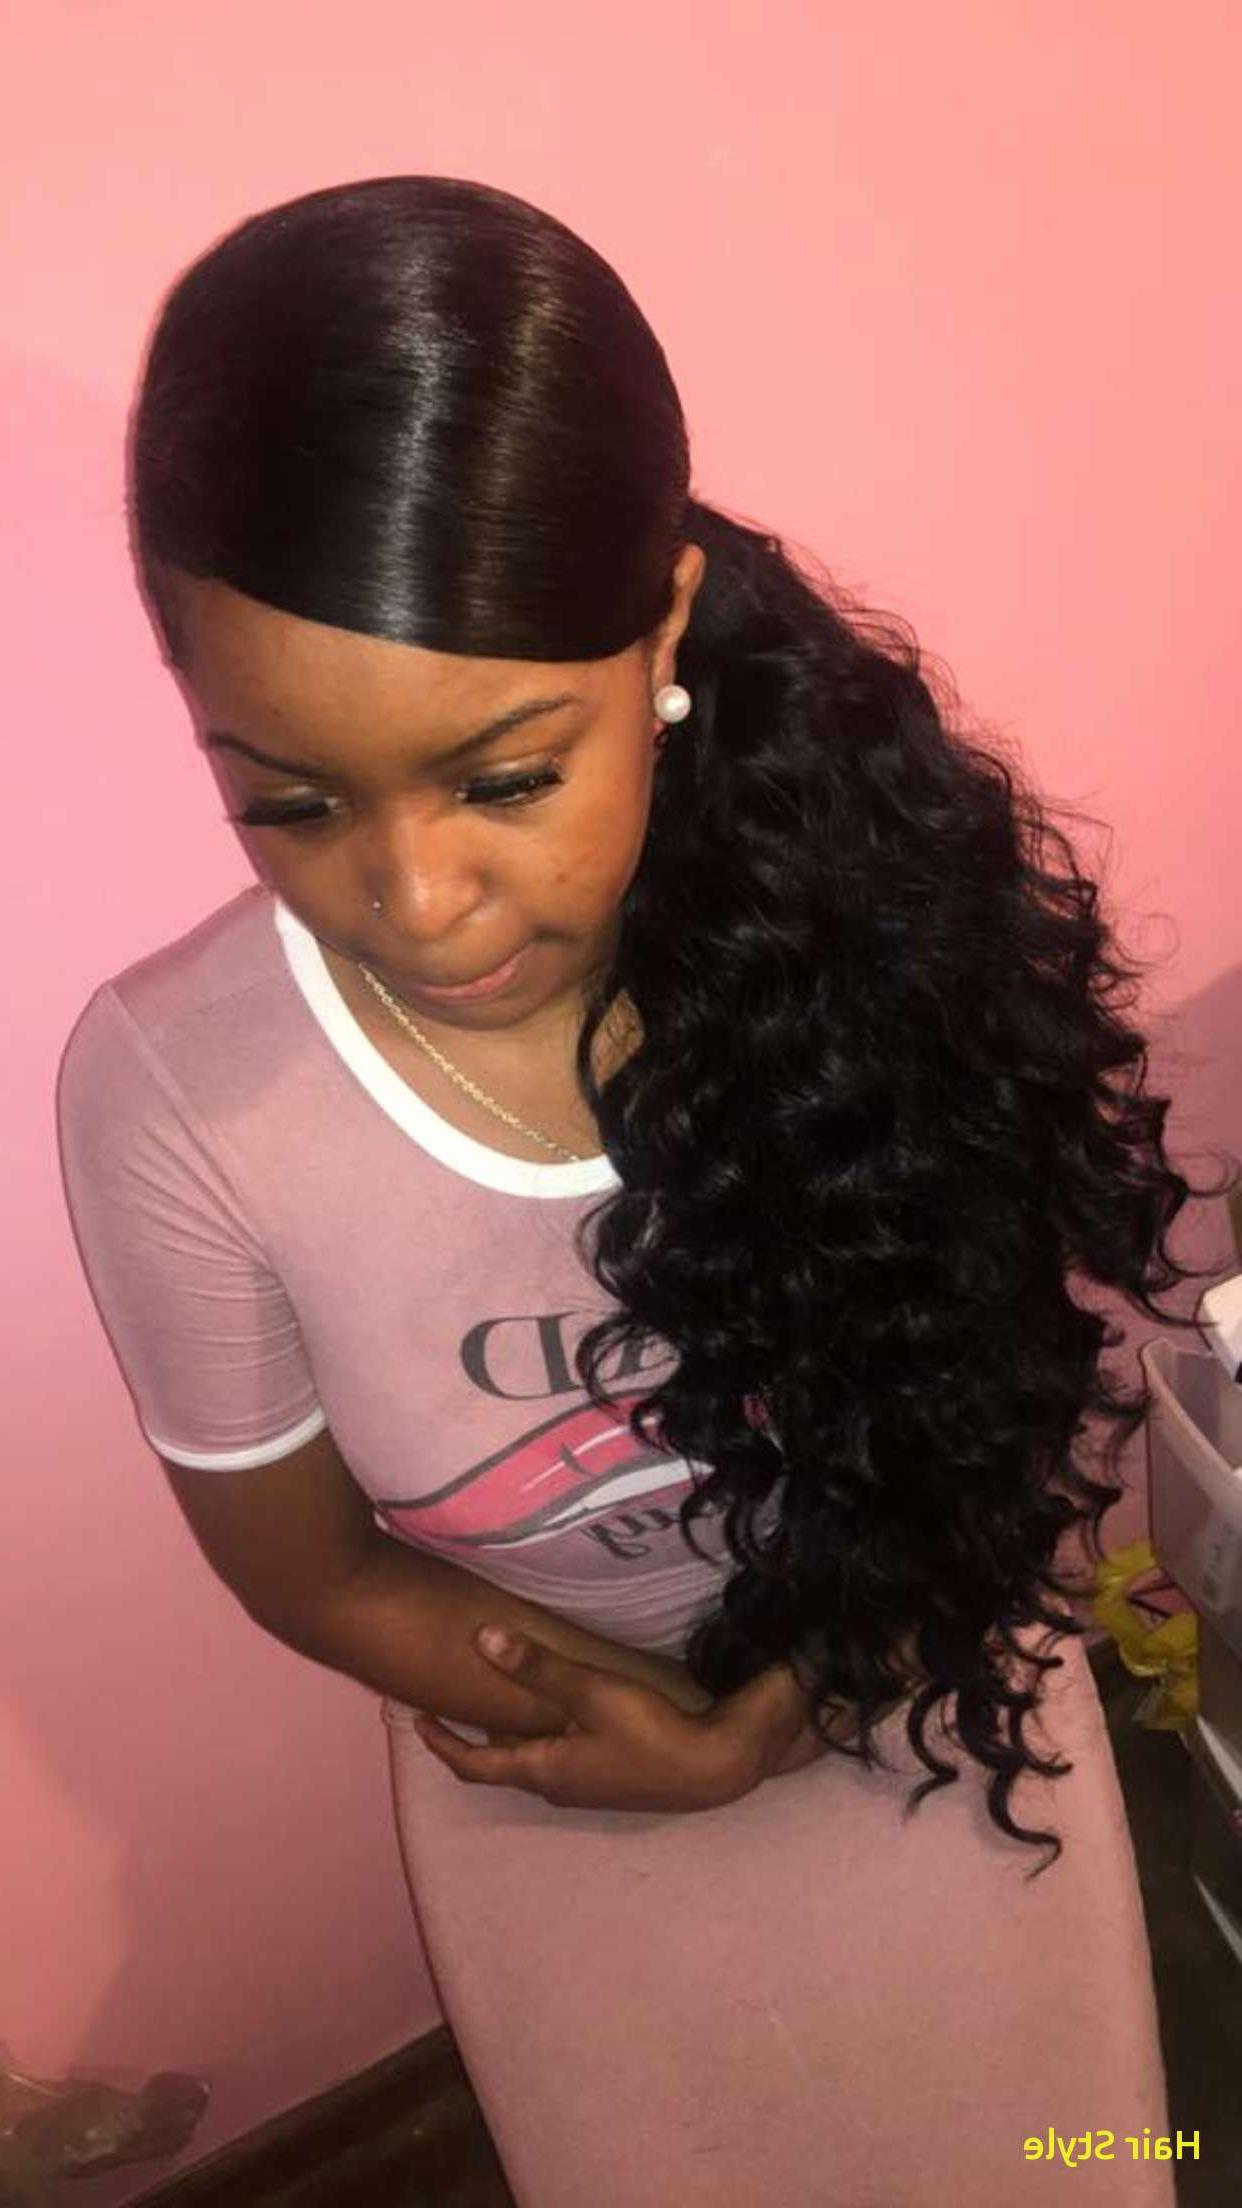 Elegant Cute Hairstyles For Short Hair For Black Teenage Girls Inside Short Haircuts For Black Teenage Girls (View 19 of 25)